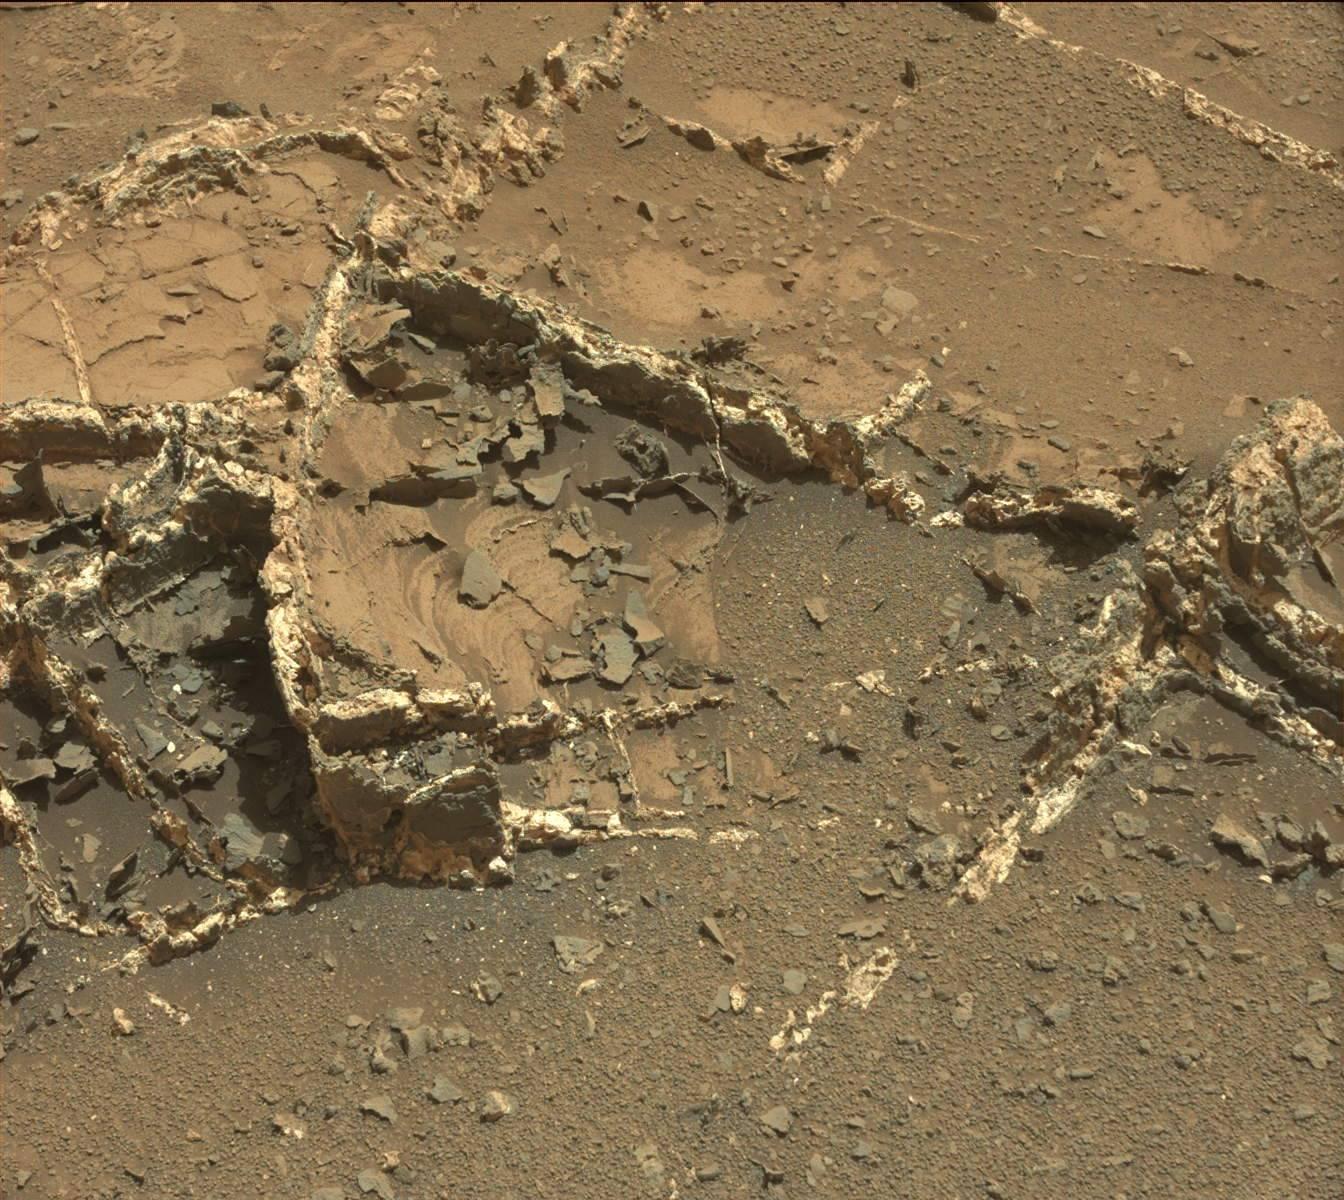 Curiosity Mars Rover: You're So Vein